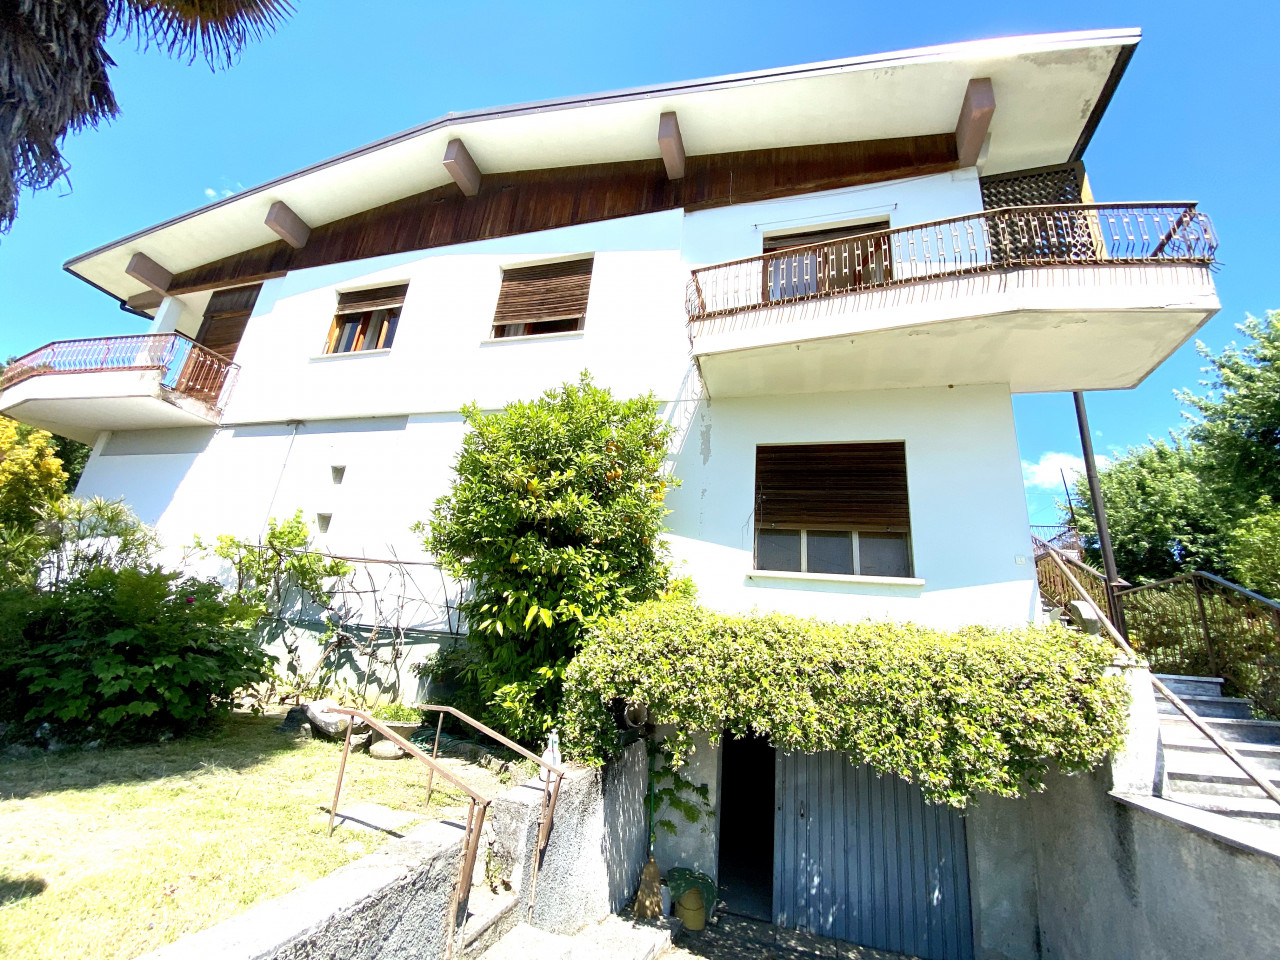 Casa singola con capannone in vendita in centro a Budoia - Rif. V.D.1 https://images.gestionaleimmobiliare.it/foto/annunci/200702/2265893/1280x1280/000__img_2968.jpg